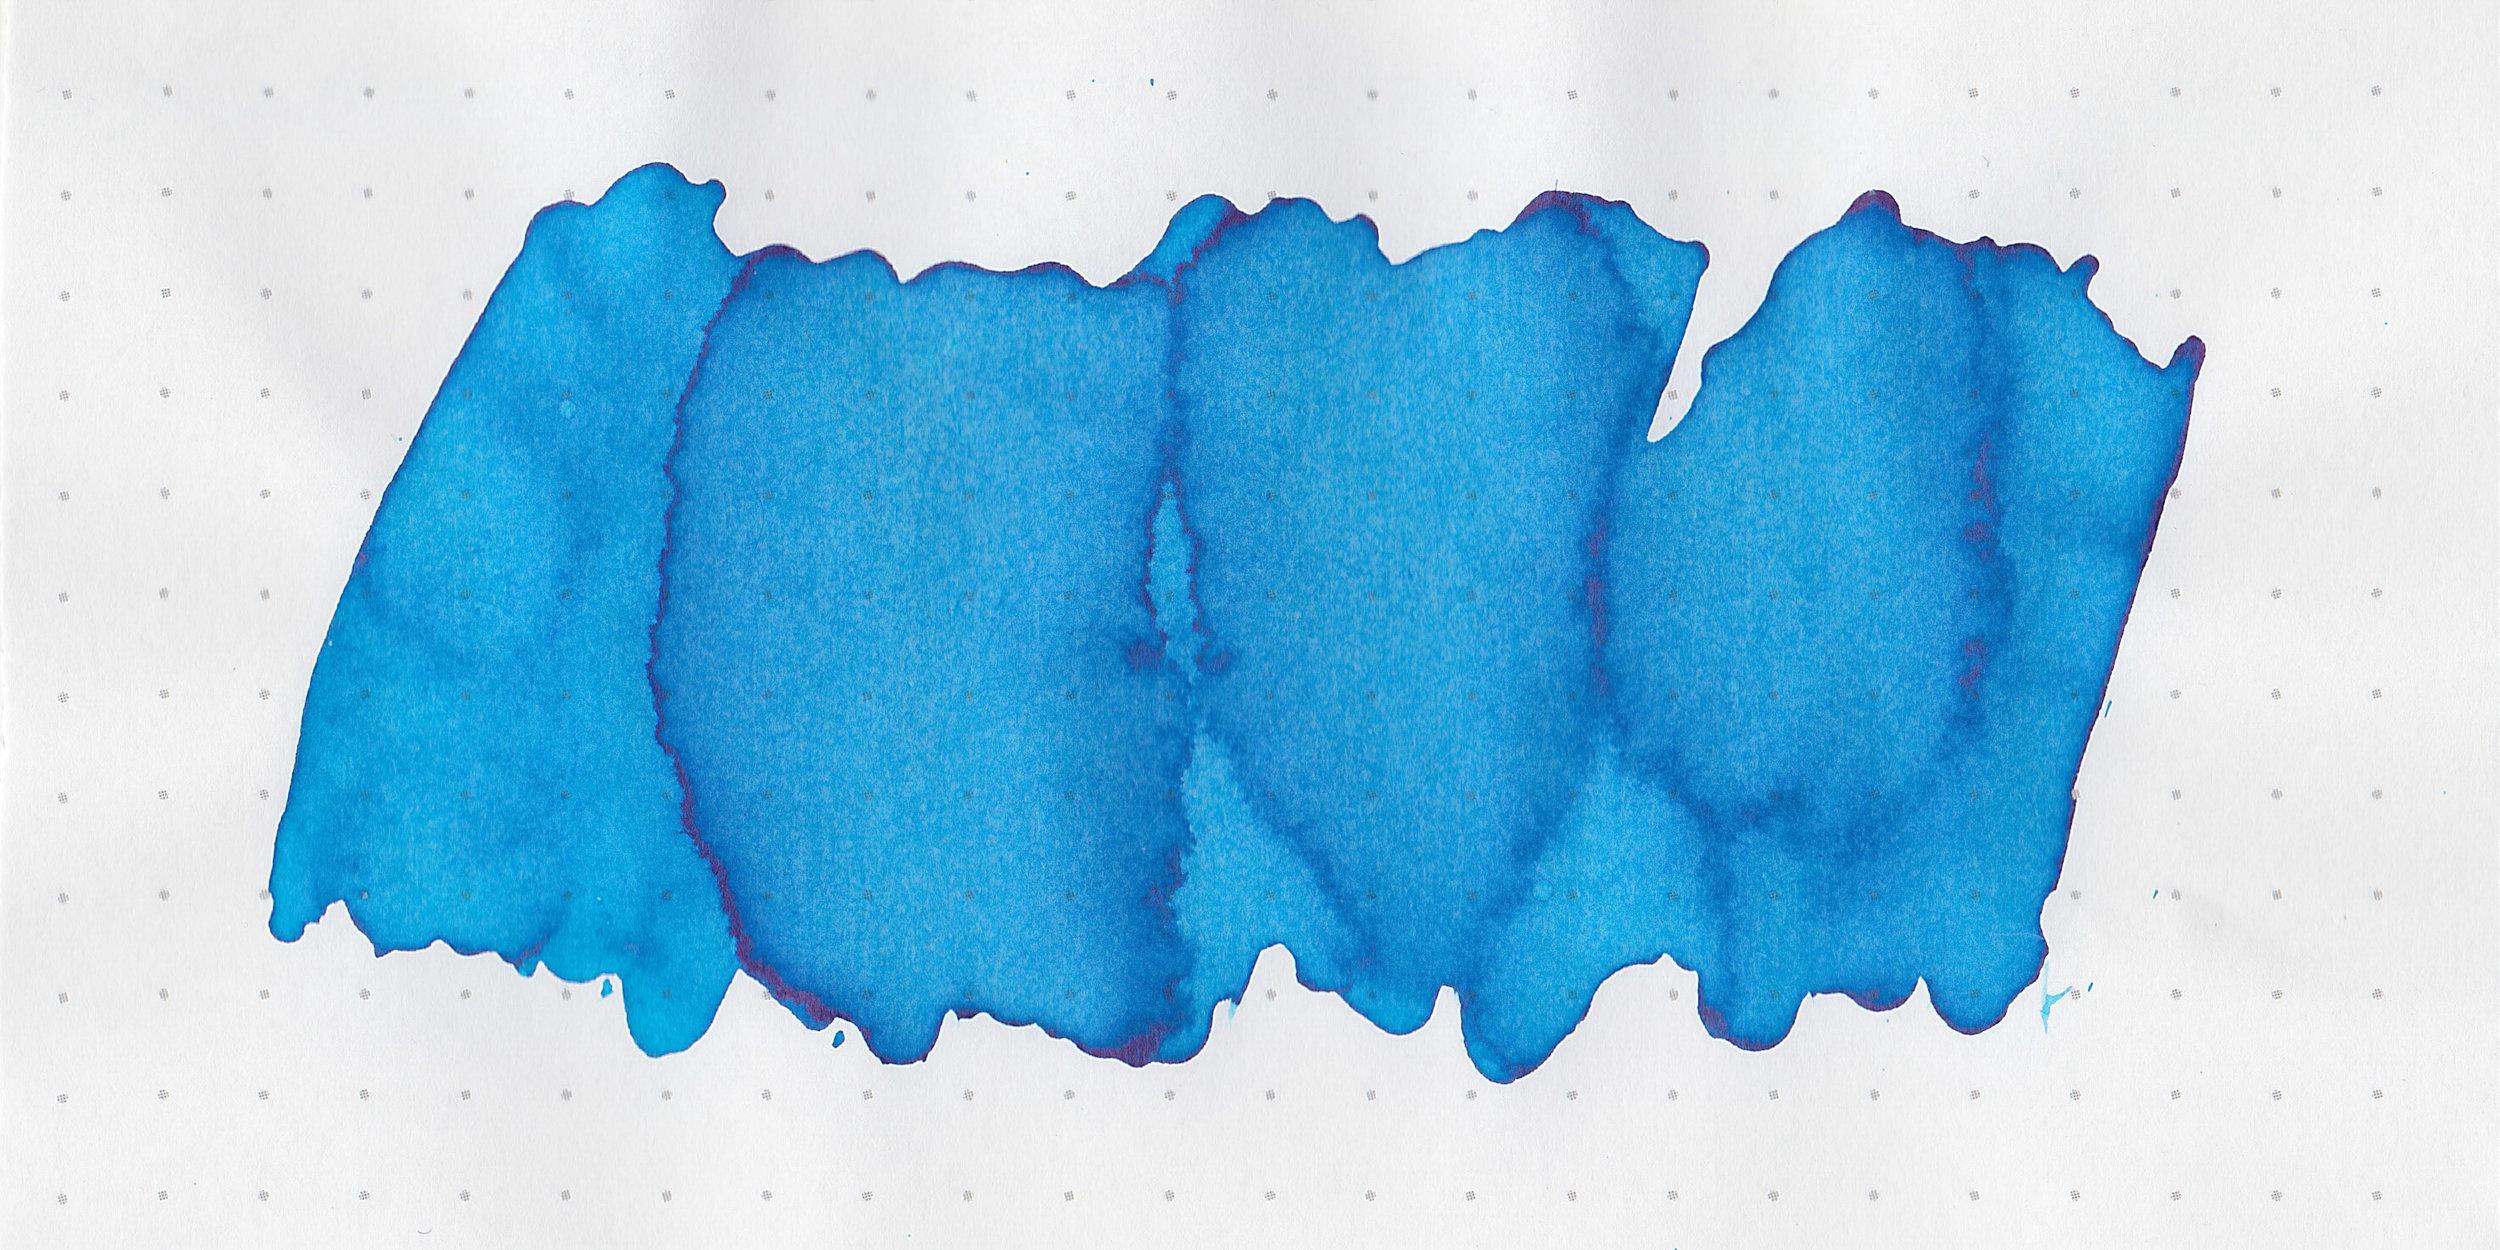 tac-sora-sky-blue-5.jpg